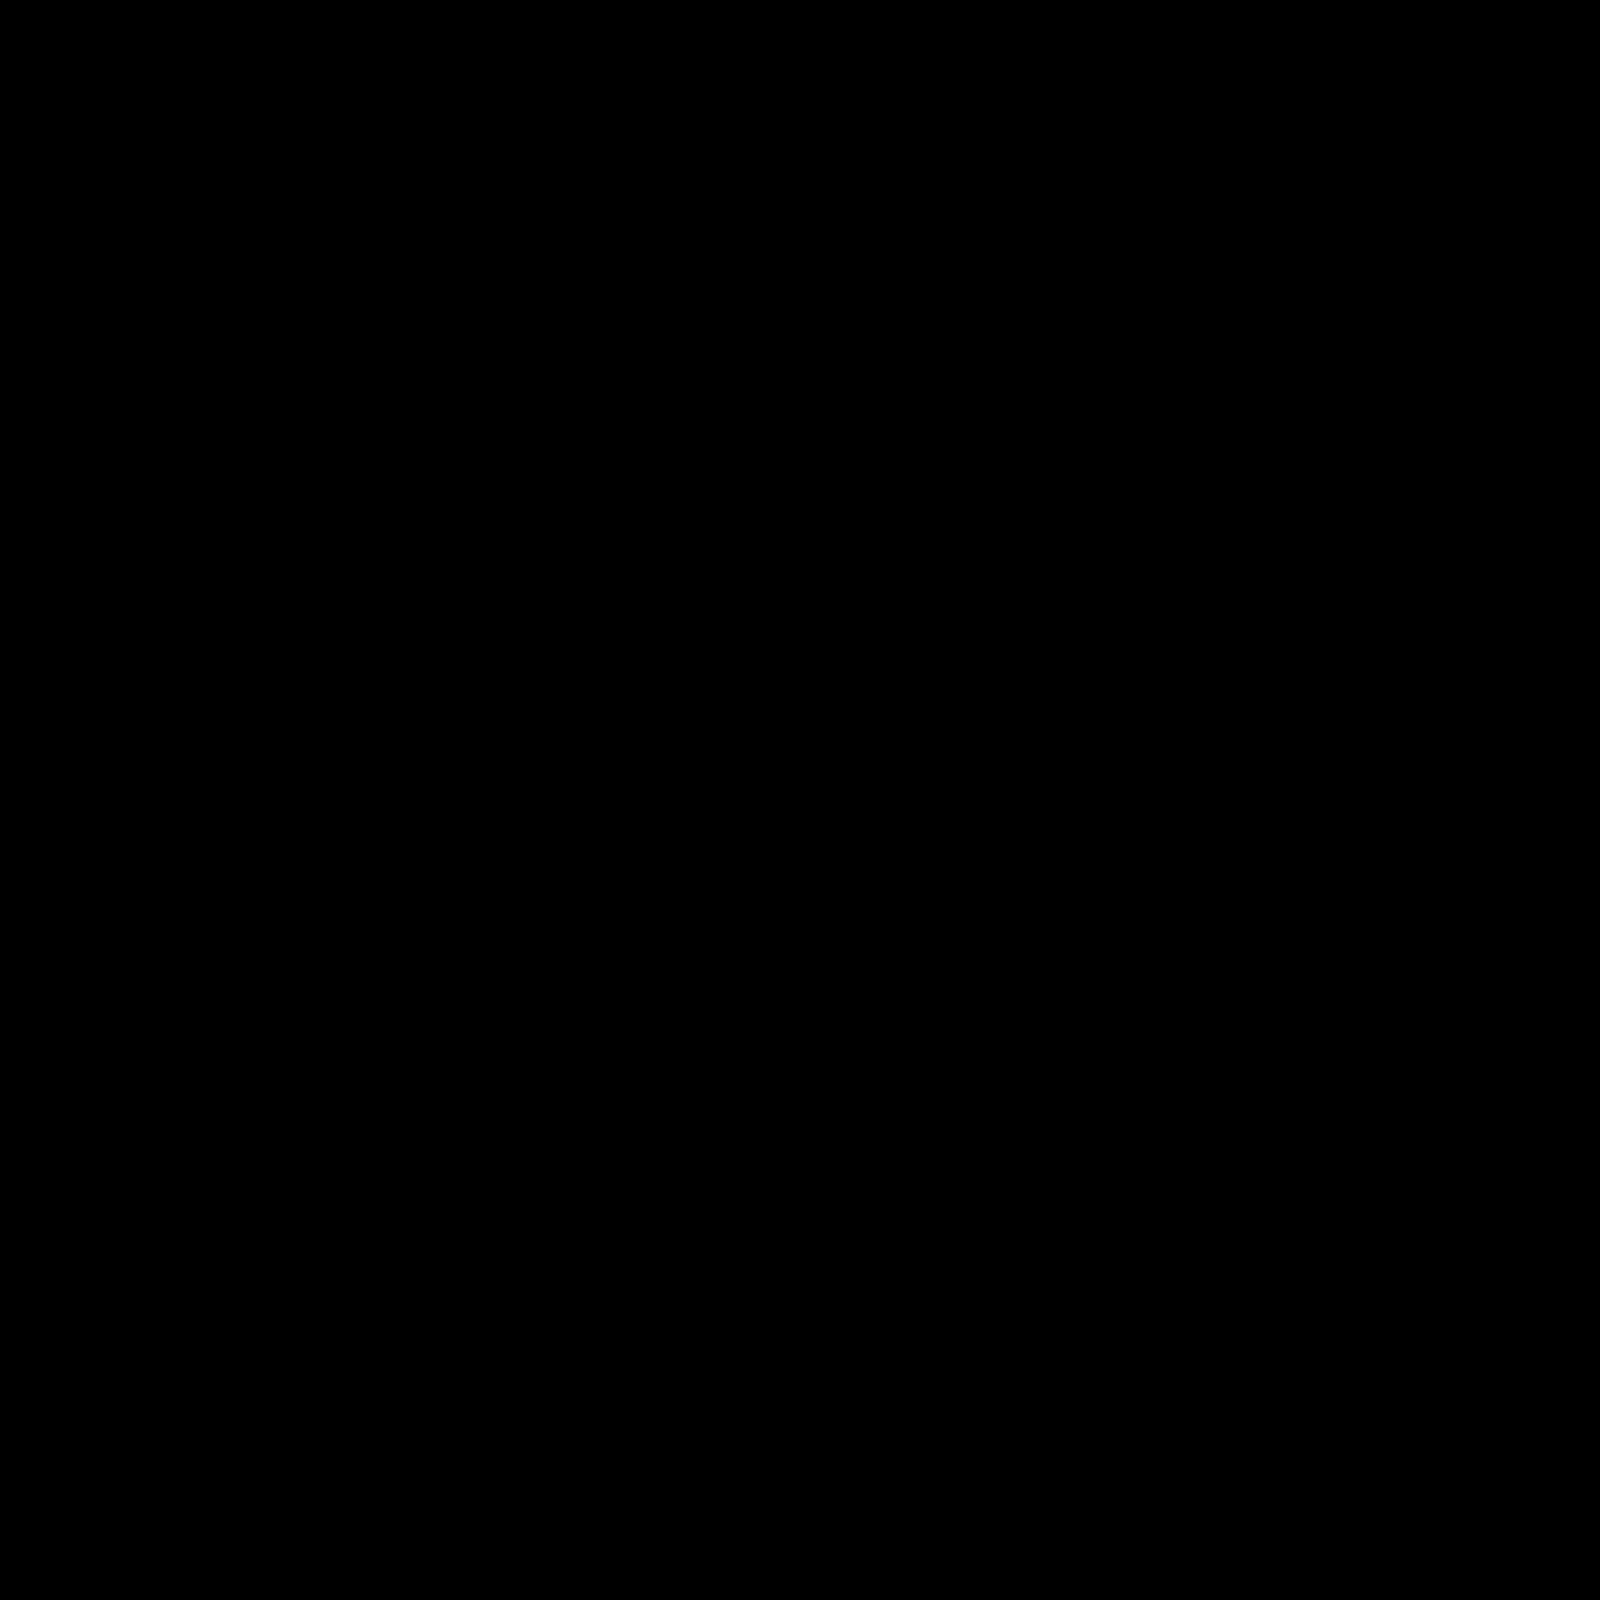 Zakreślone Q icon